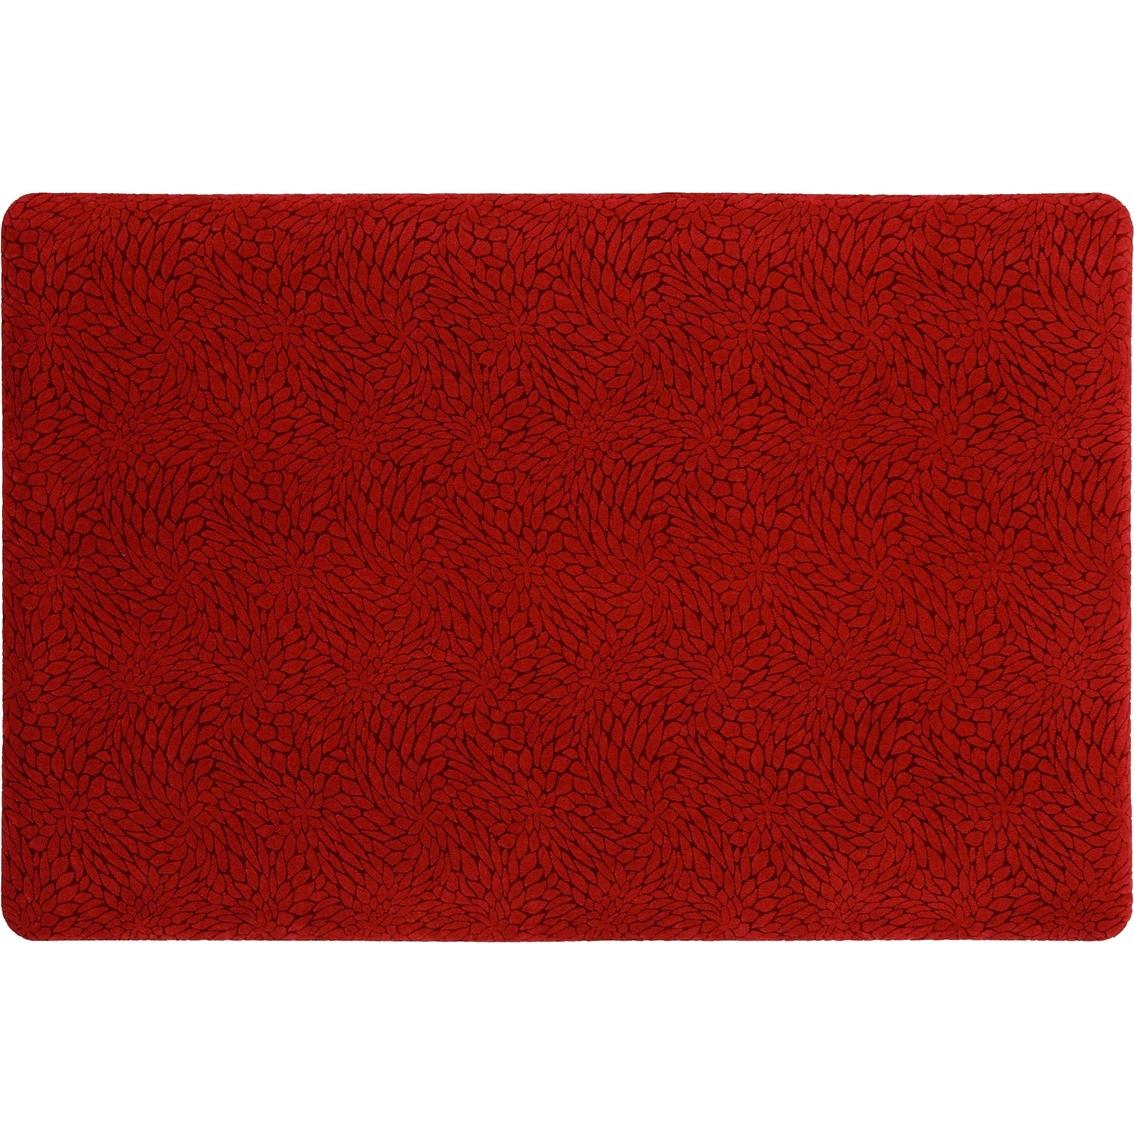 Red Kitchen Rugs And Mats Mohawk Home Rejuvenation Kitchen Mat Door Comfort Mats Home